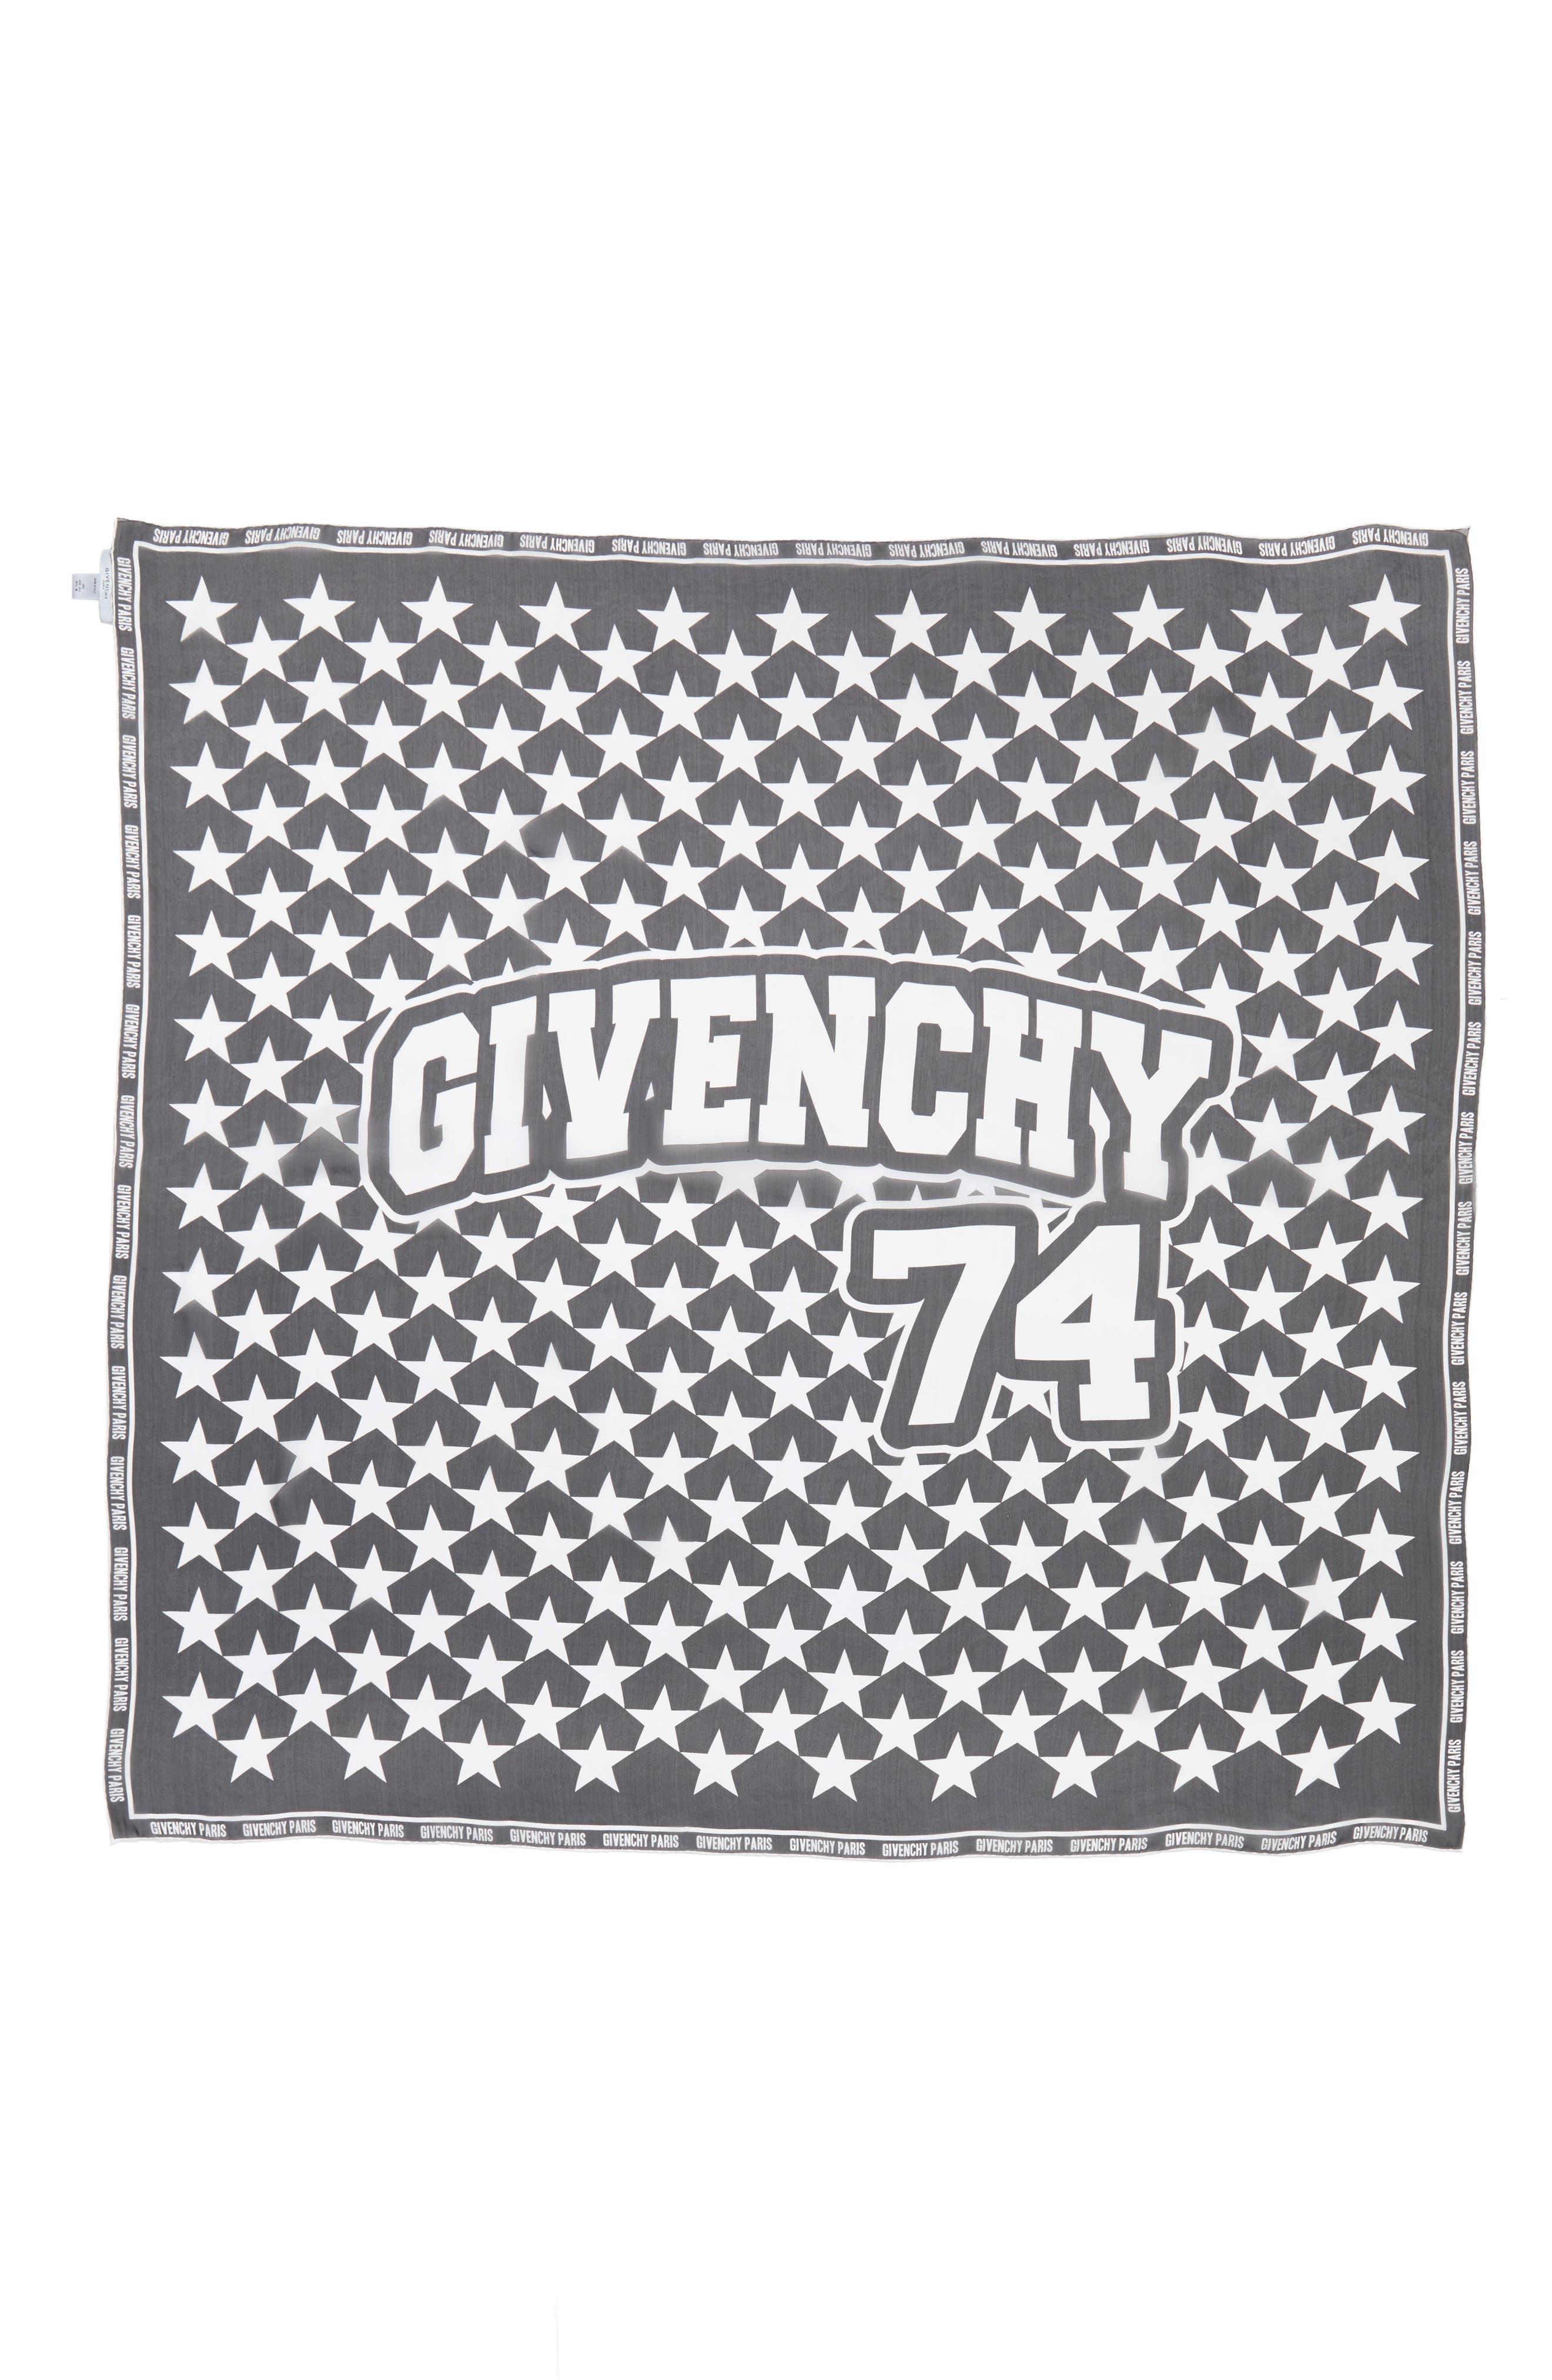 Main Image - Givenchy 74 Square Silk Scarf